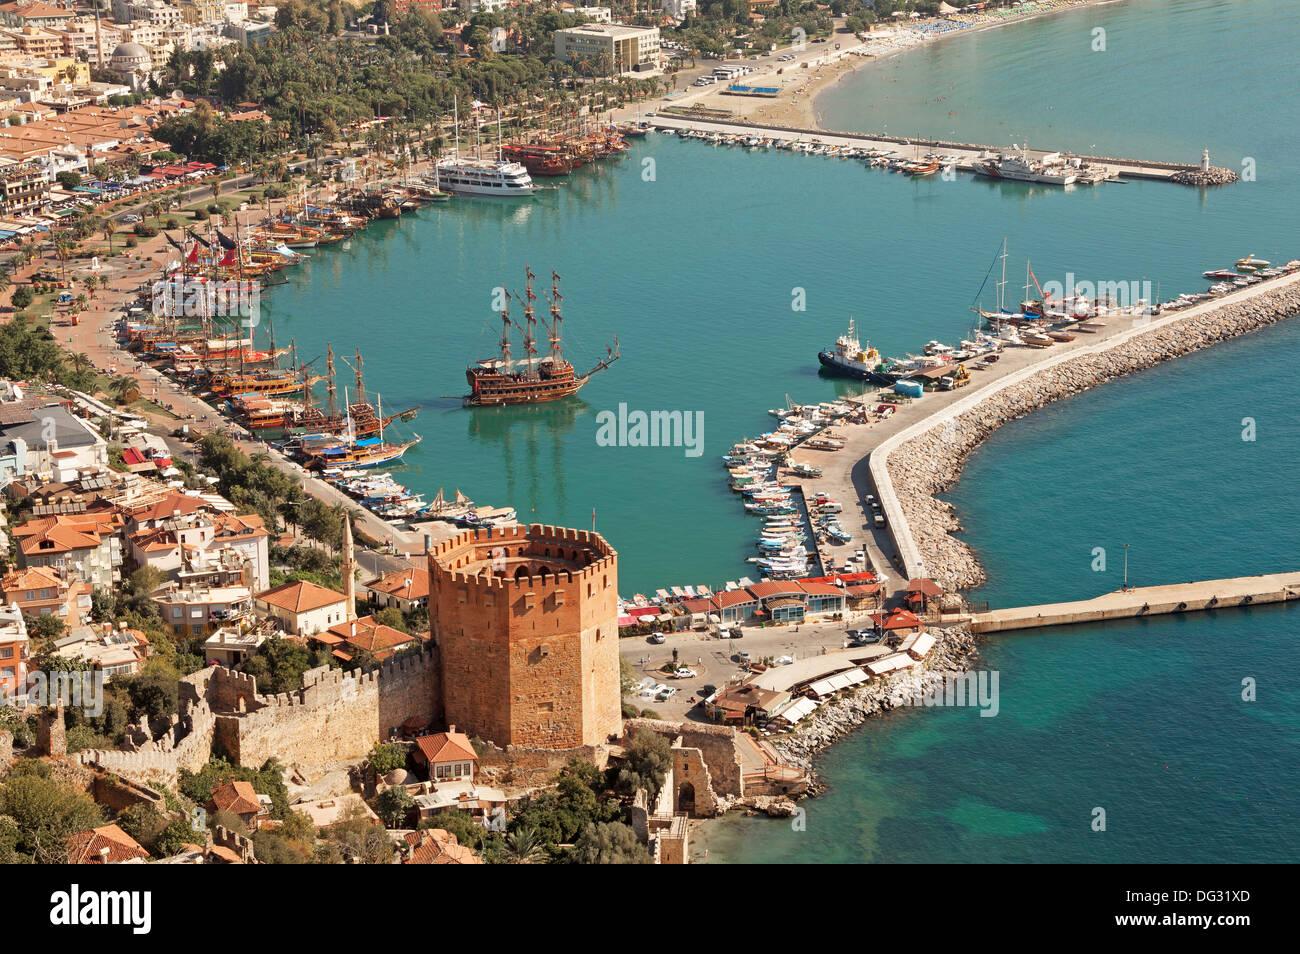 Alanya harbor and Kizil Kule tower. Turkey. - Stock Image